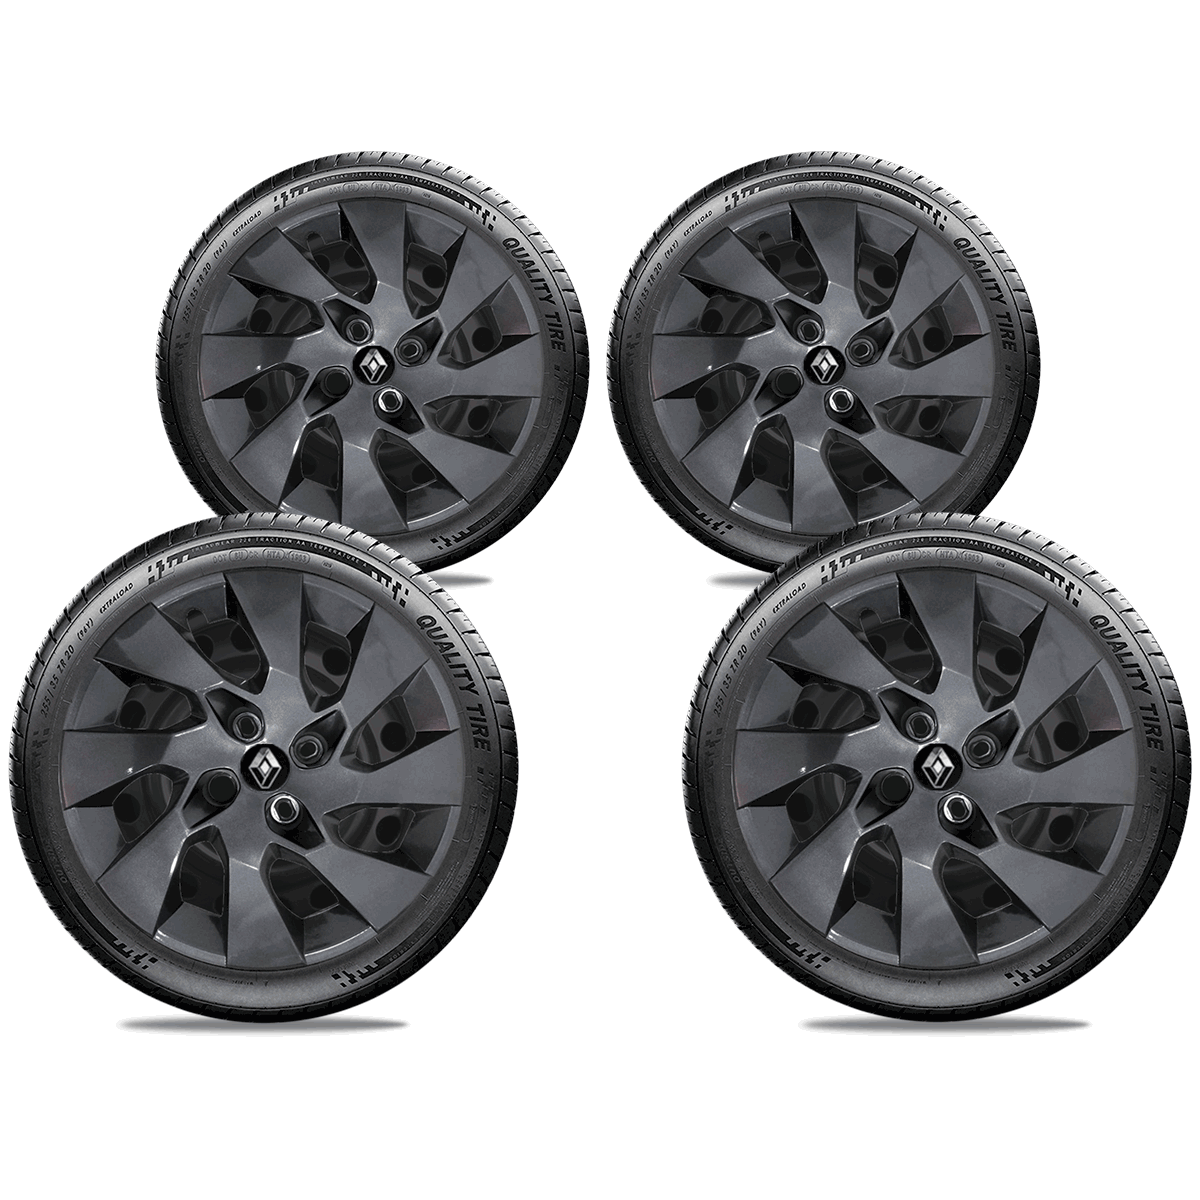 Calota Grafite Jogo 4Pçs Renault Novo Sandero 2020 Aro 15 G195Gftj